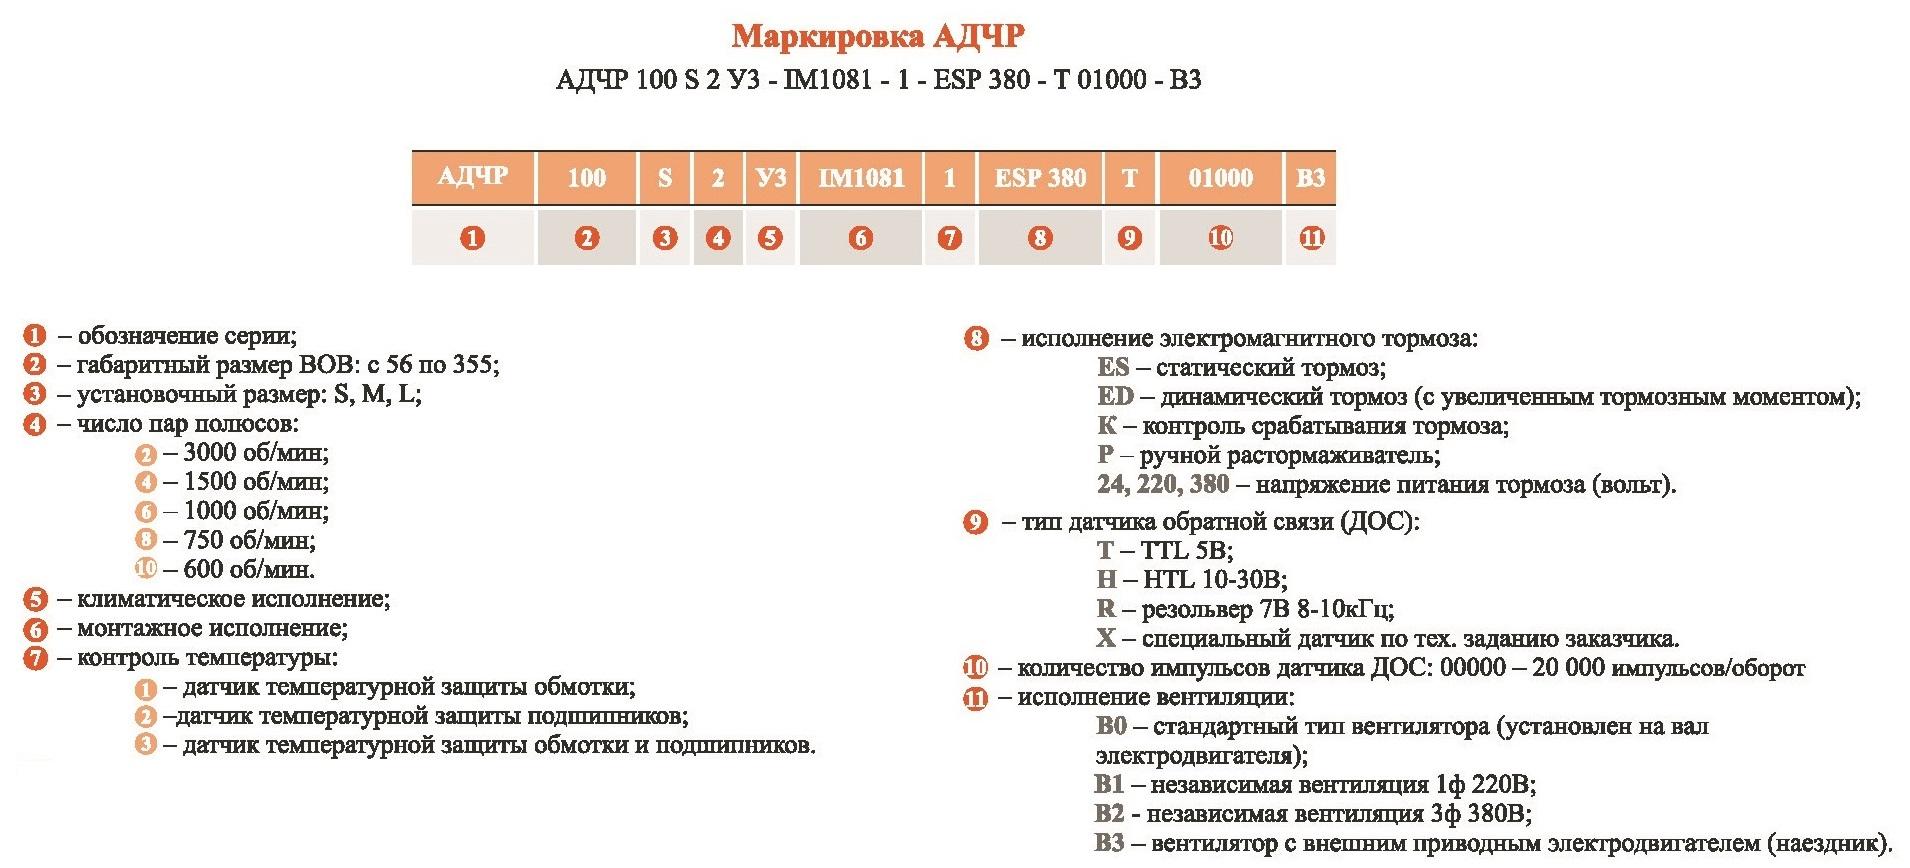 Расшифровка маркировки электродвигателей АДЧР